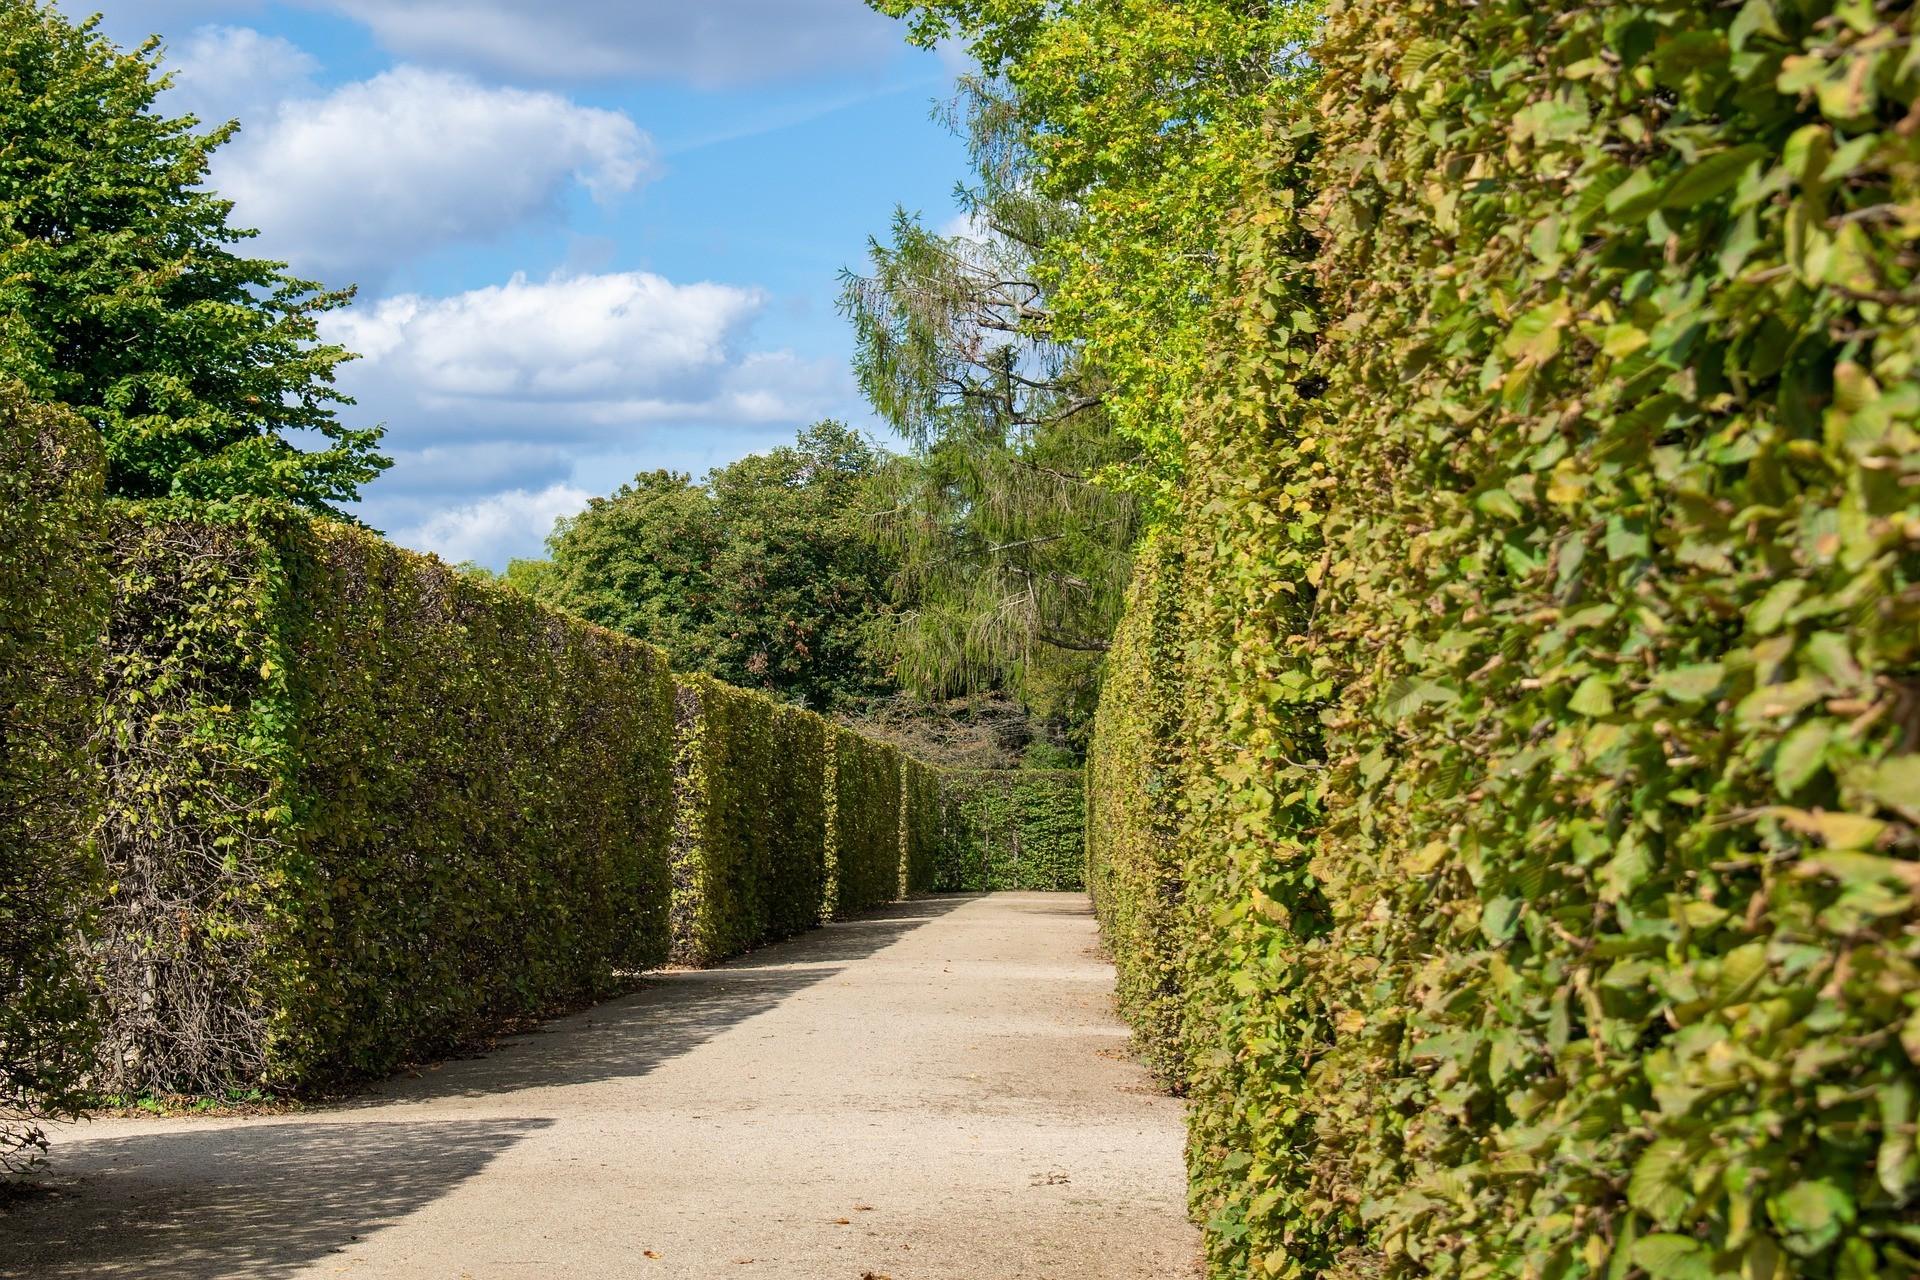 hedge 4476859 1920